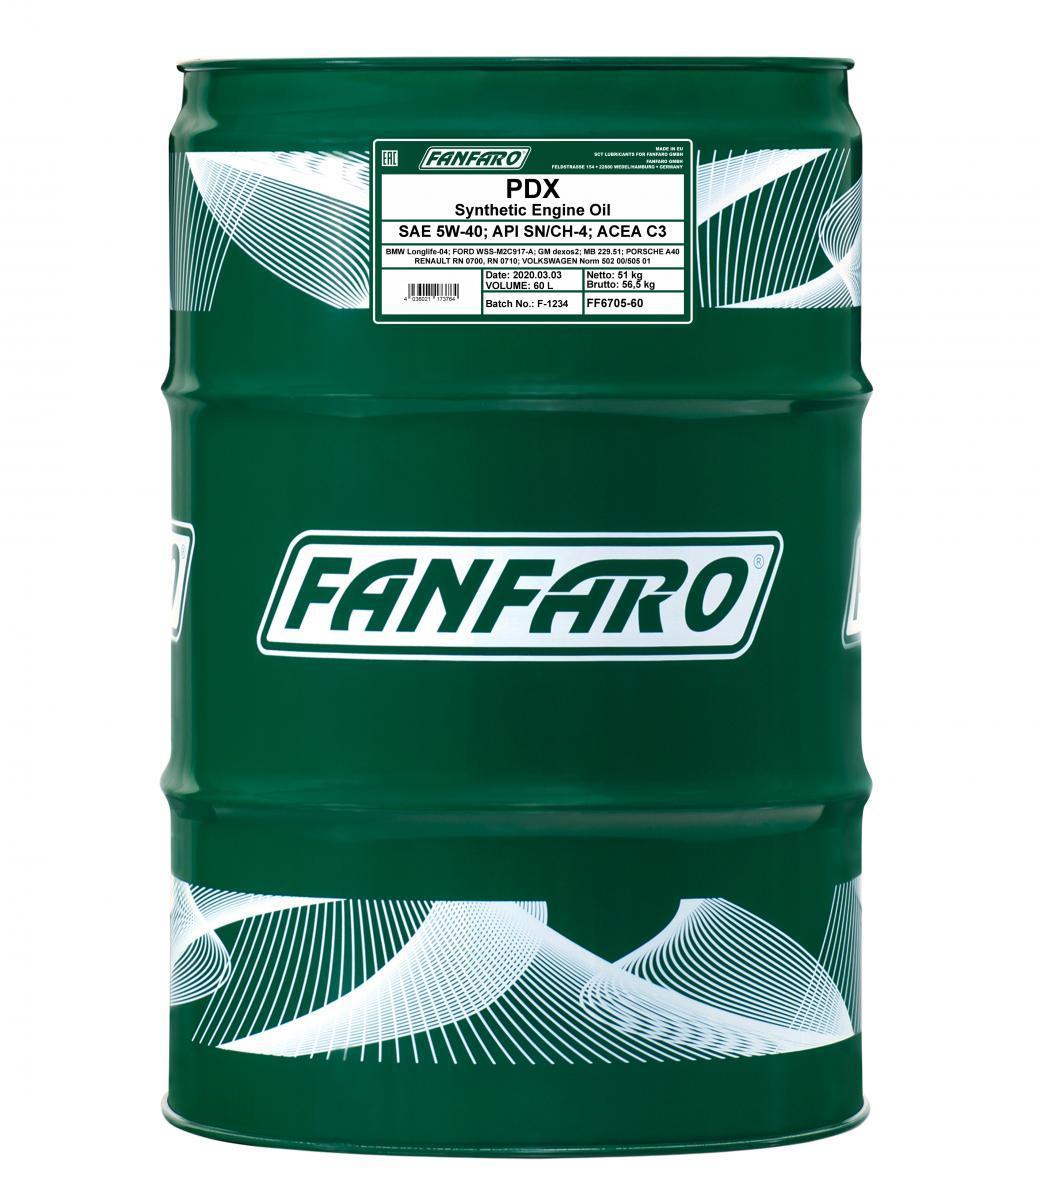 FF6705-60 FANFARO Profi Line, PDX 5W-40, 60l, Synthetiköl Motoröl FF6705-60 günstig kaufen